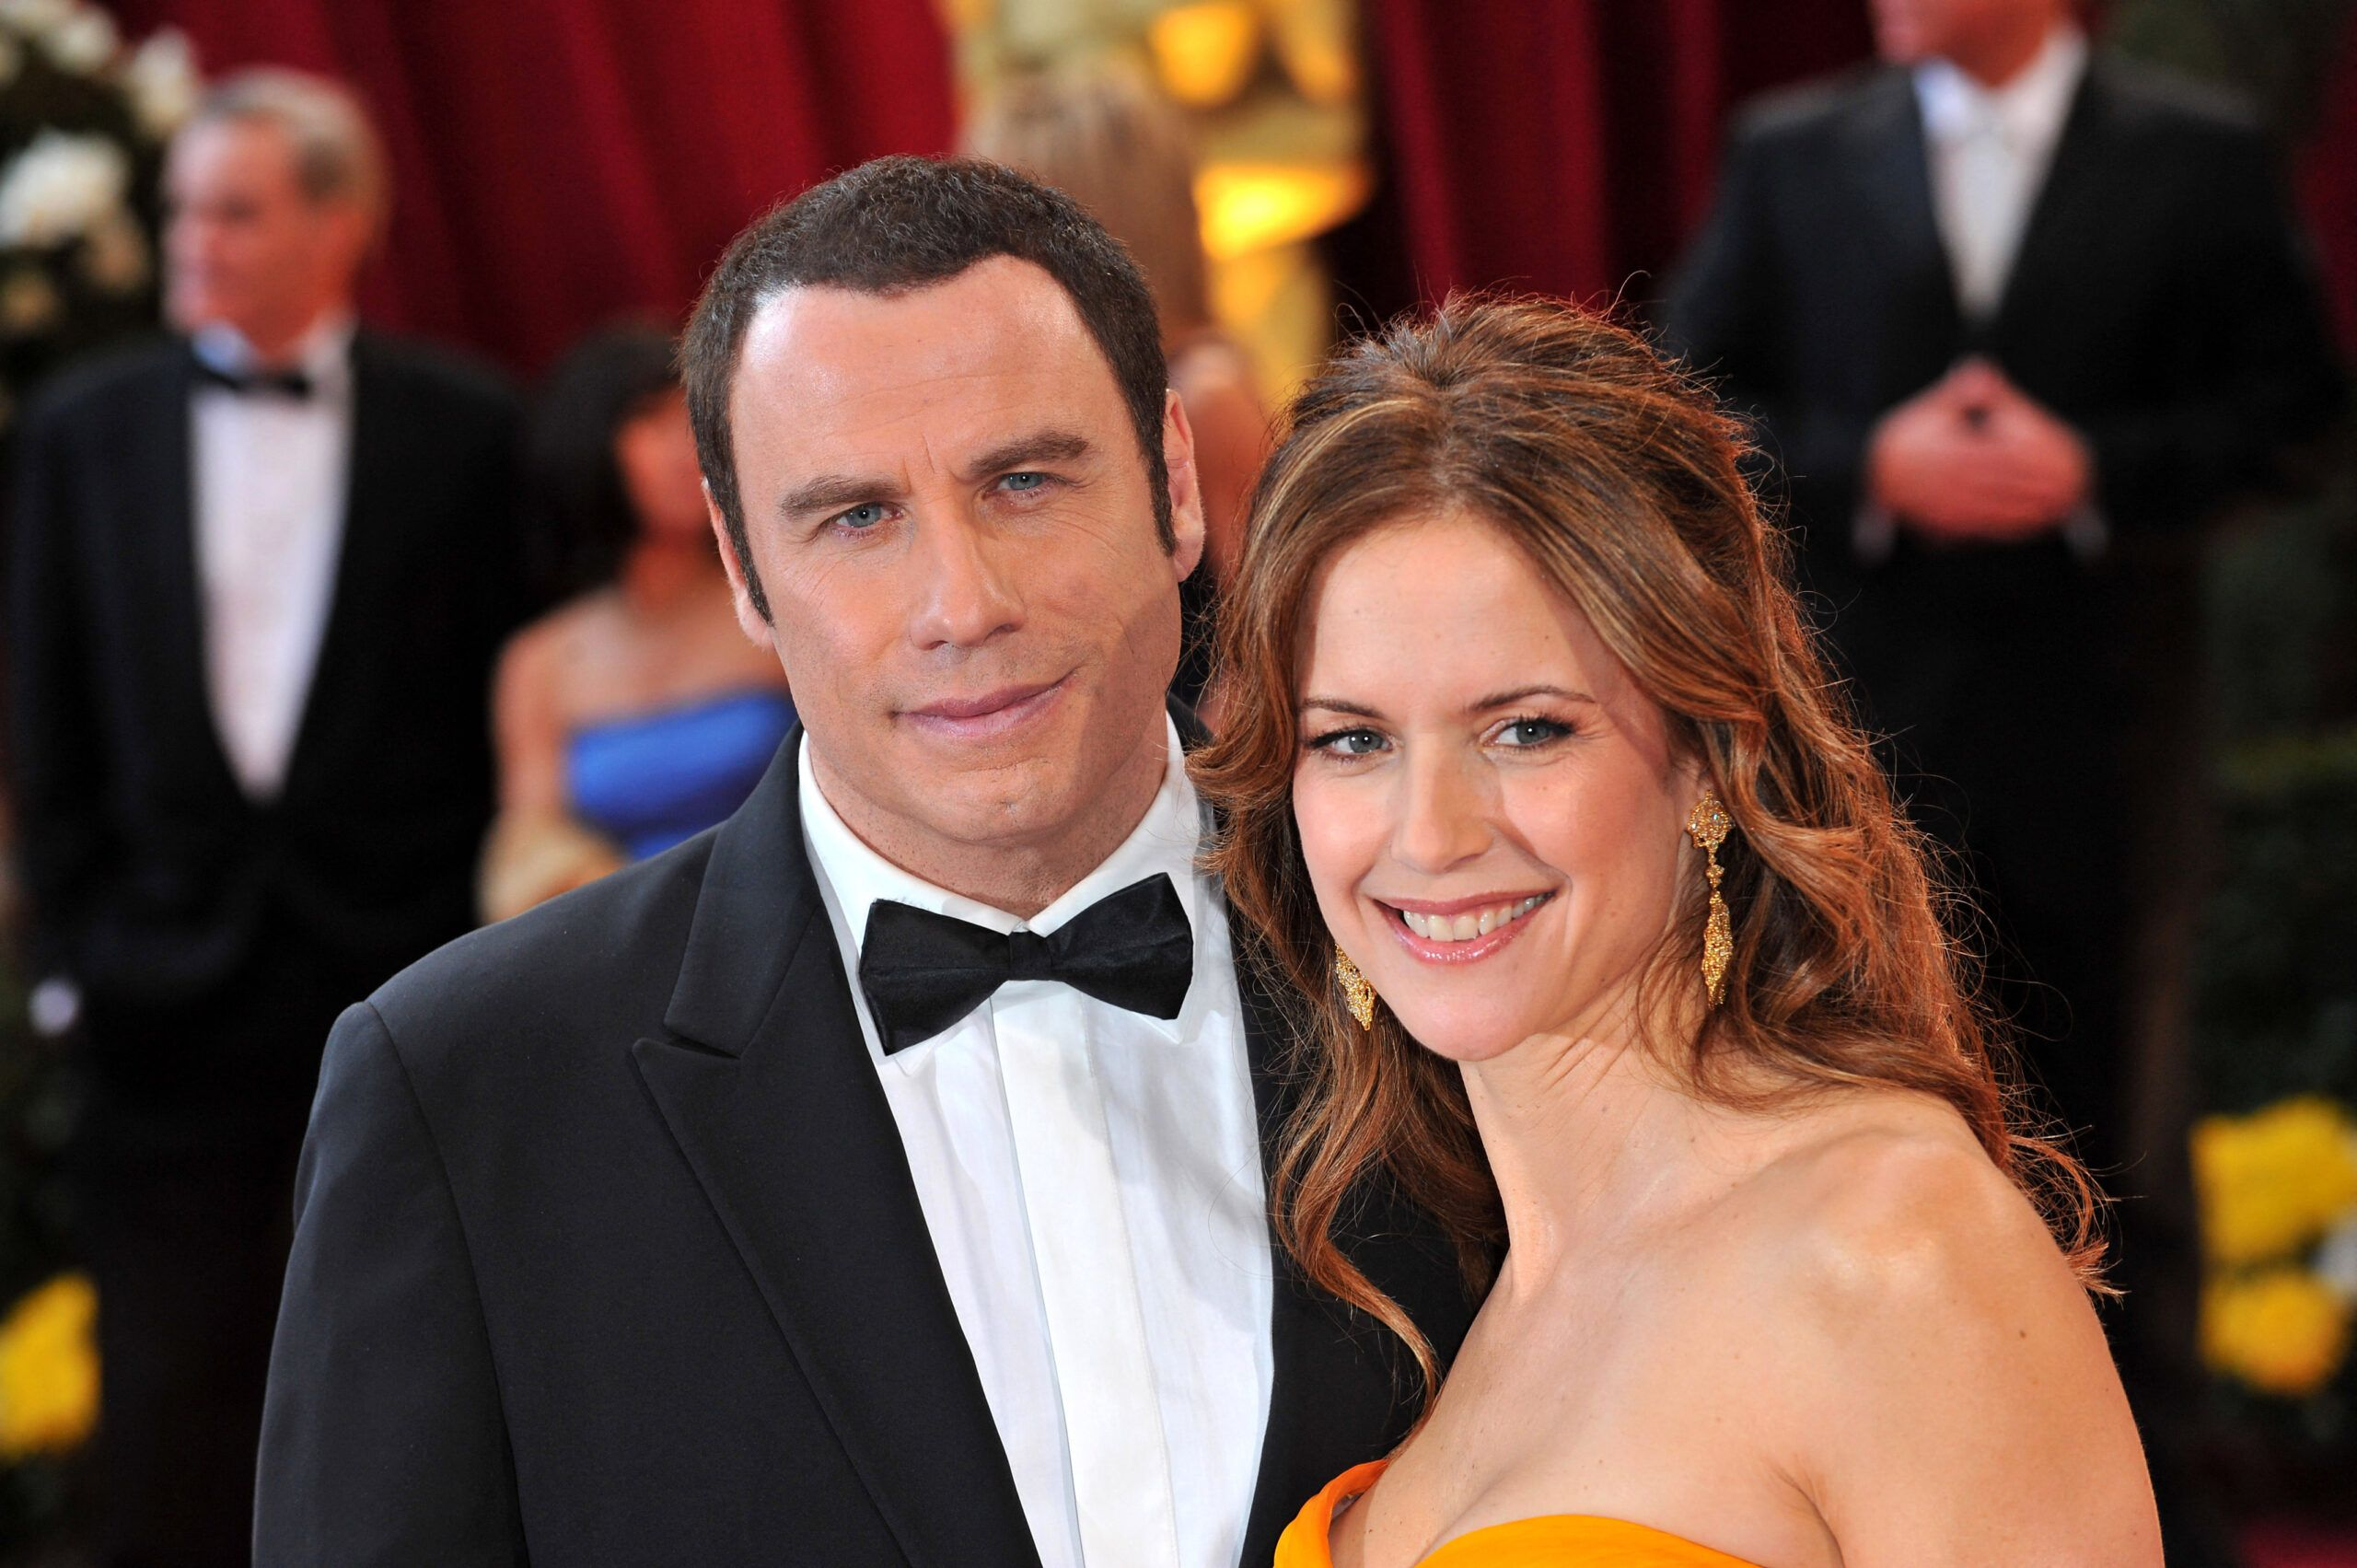 John Travolta Shares Throwback Wedding Photo To Honor Late Wife Kelly Preston's 58th Birthday - Fame10